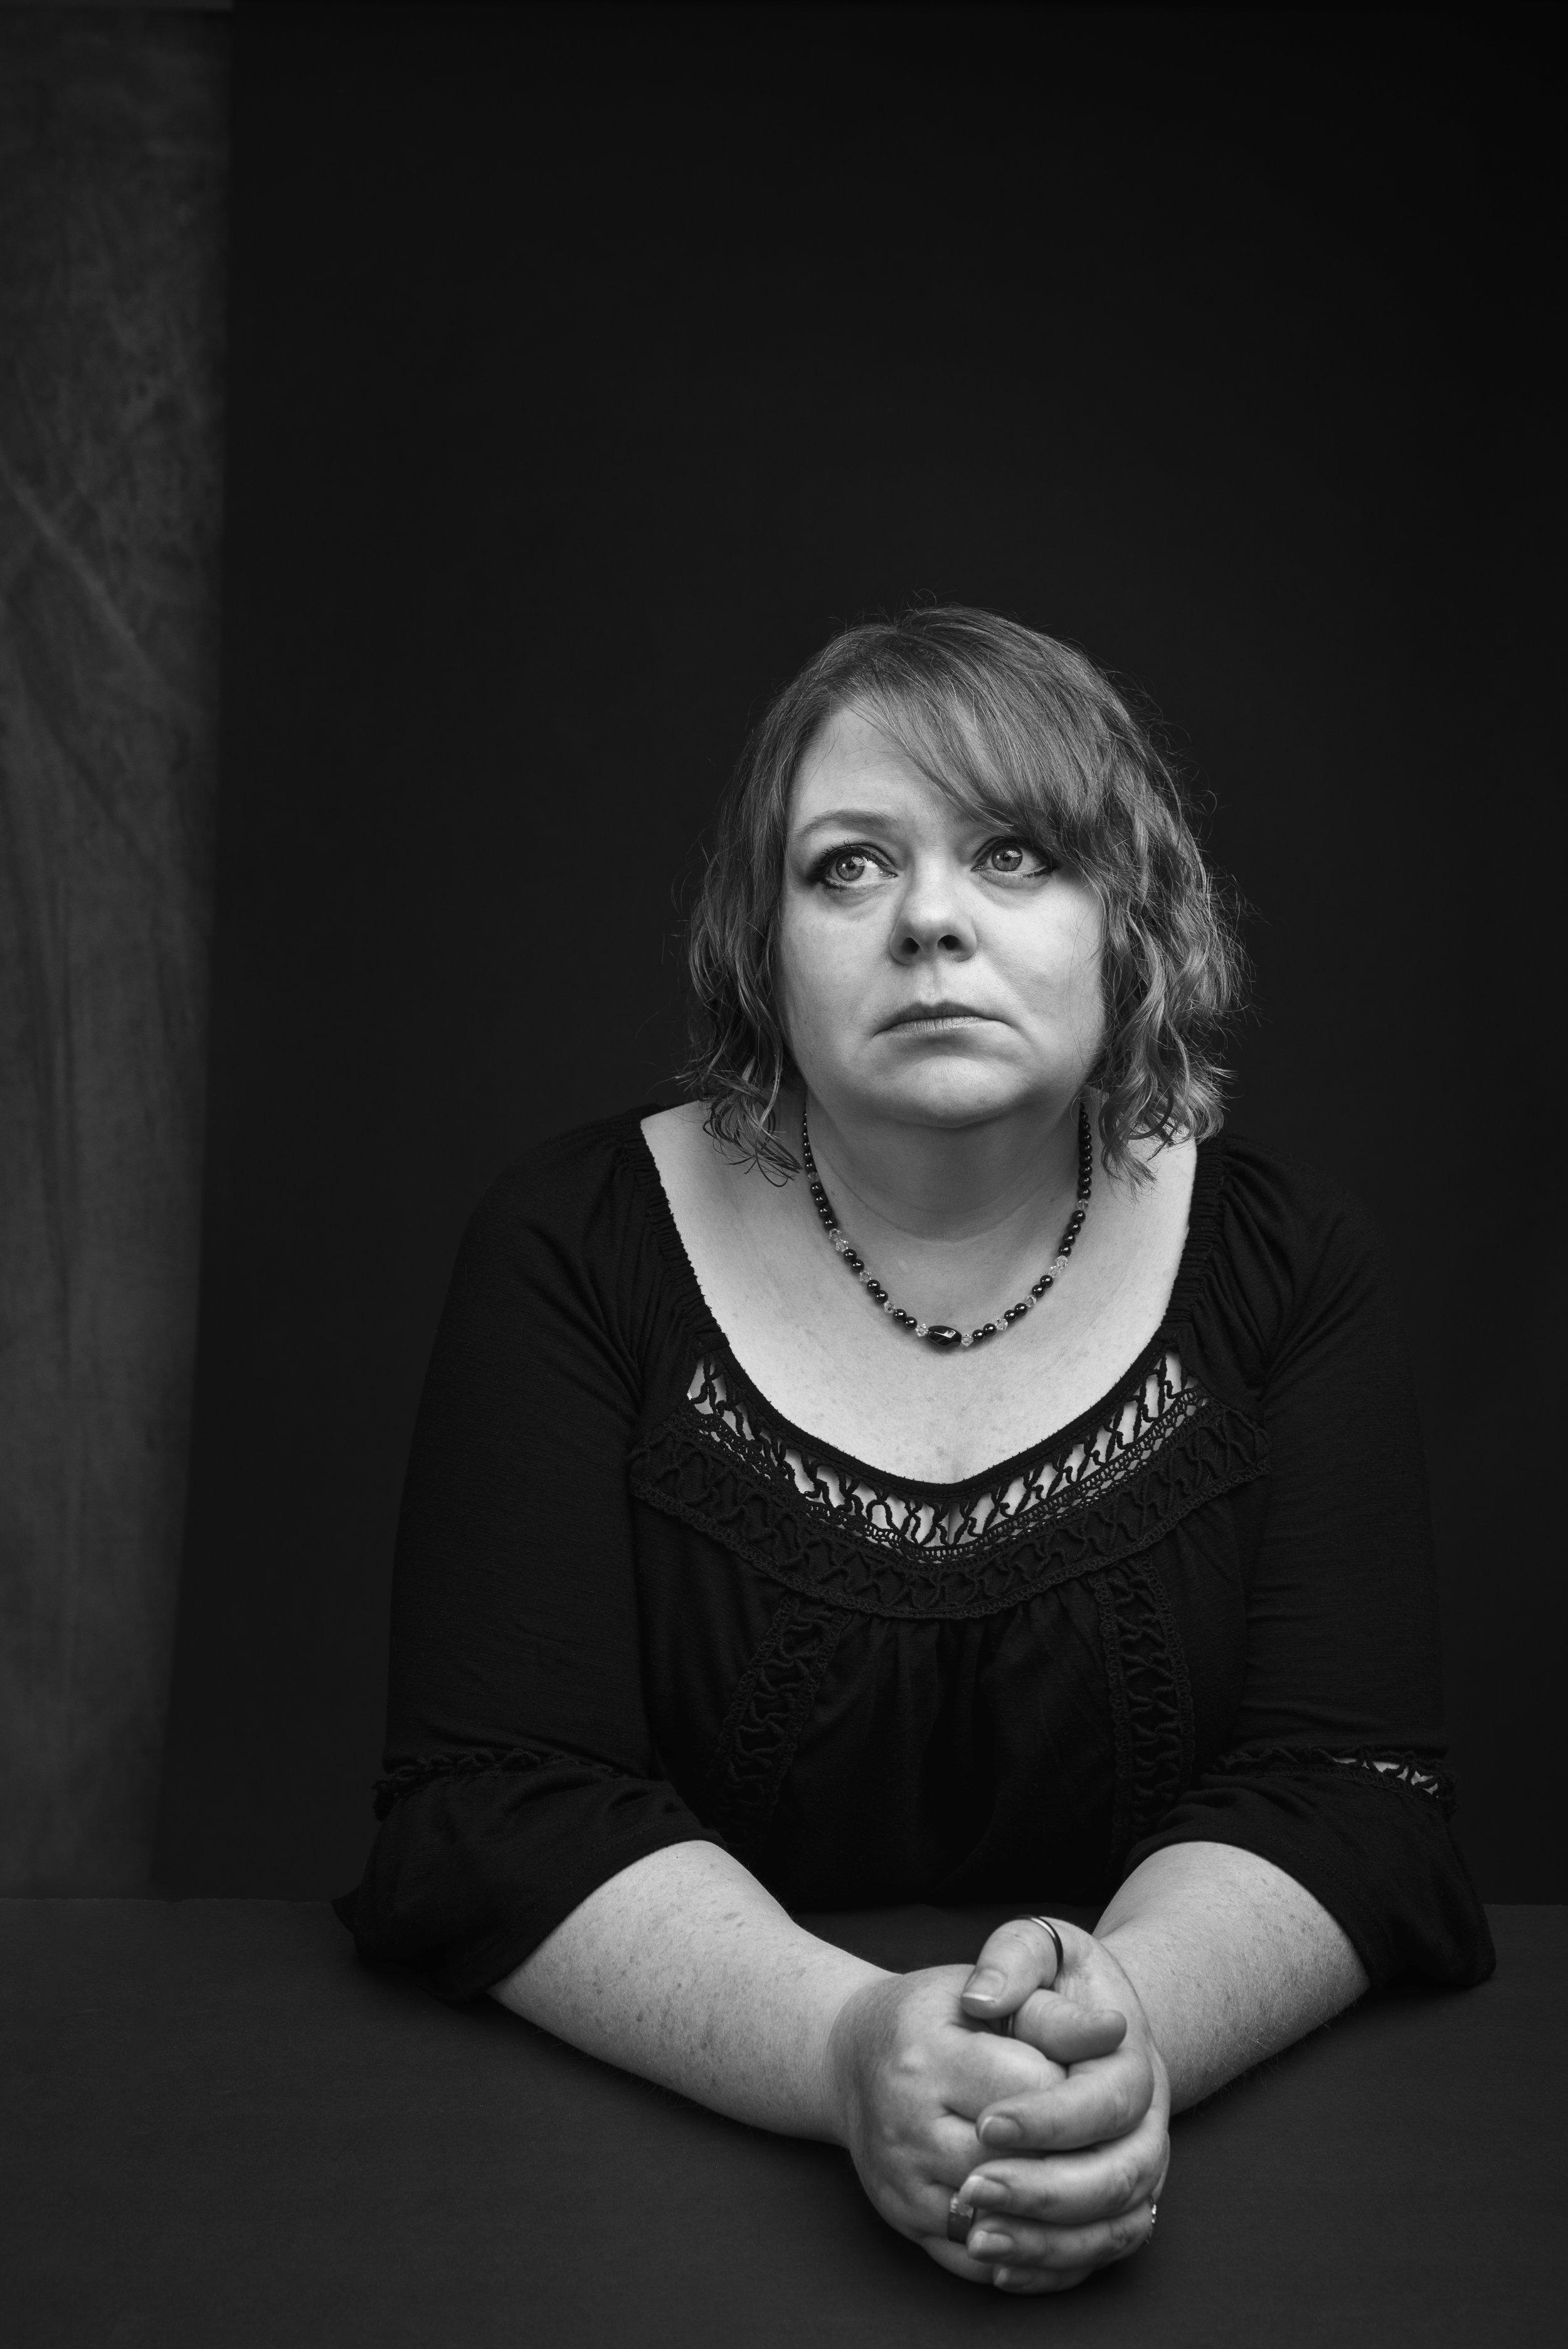 The Face of the Story-Deborah 3.jpg